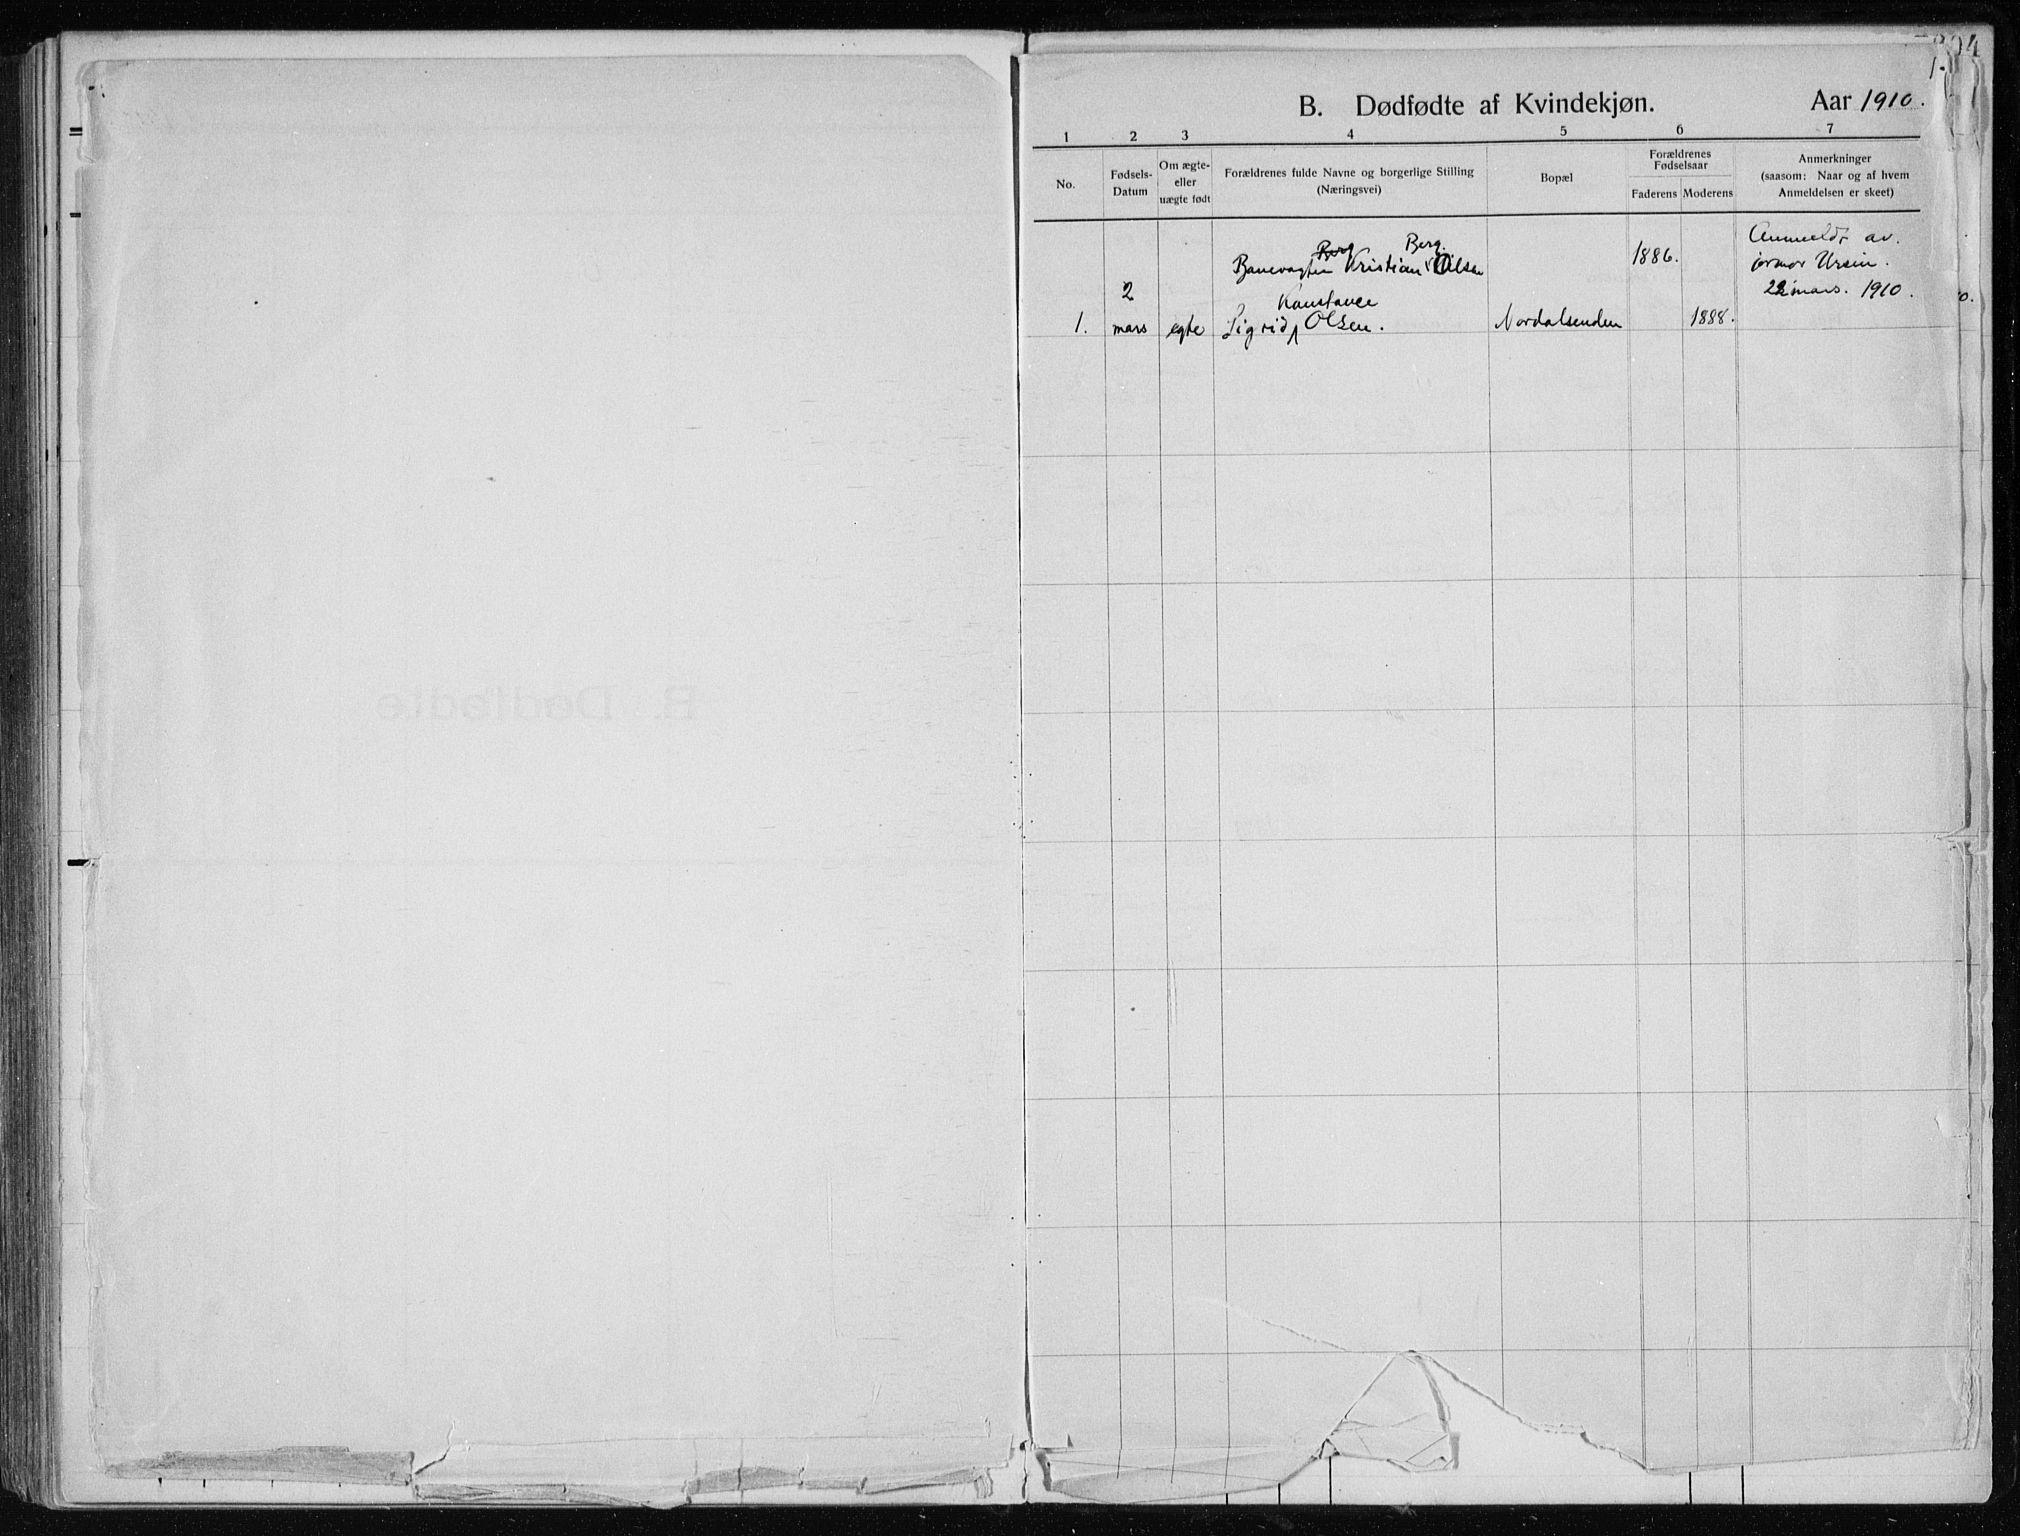 SAT, Ministerialprotokoller, klokkerbøker og fødselsregistre - Nordland, 866/L0941: Ministerialbok nr. 866A04, 1901-1917, s. 0-1